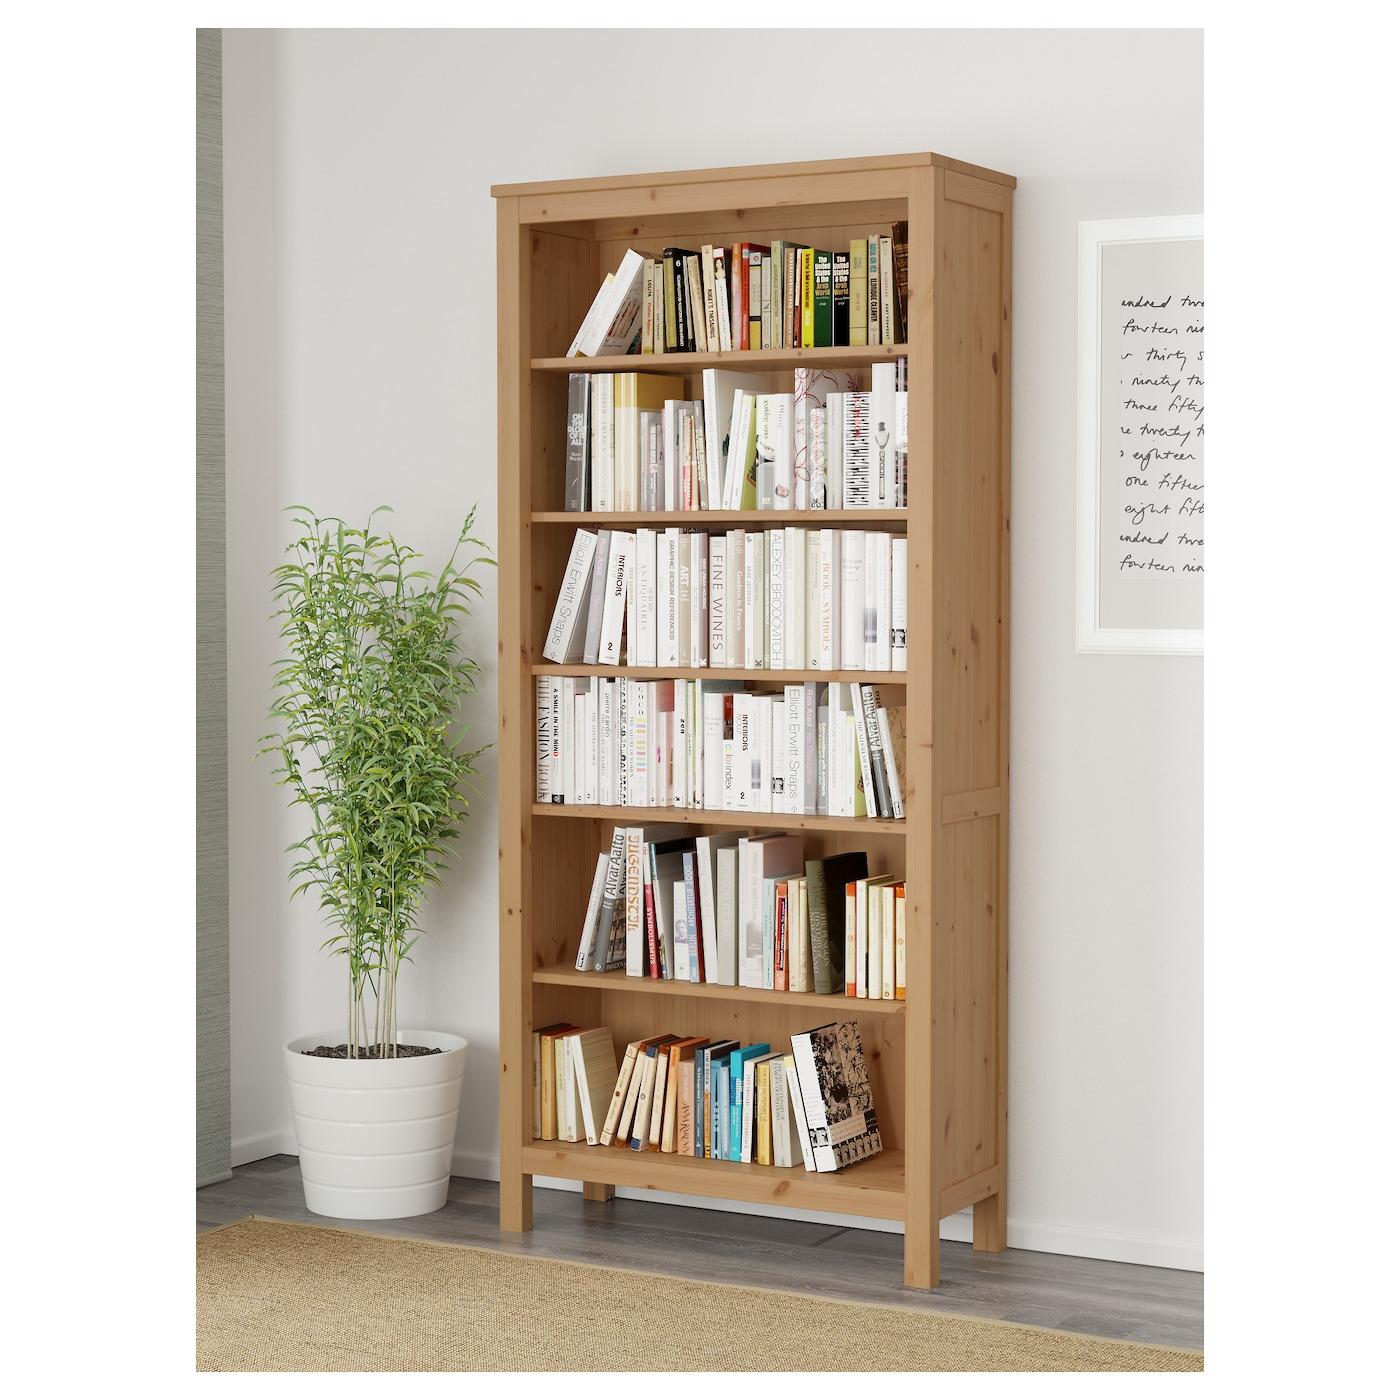 Hemnes Coffee Table White Stain 90 X 90 Cm: HEMNES Bookcase Light Brown 90 X 197 Cm